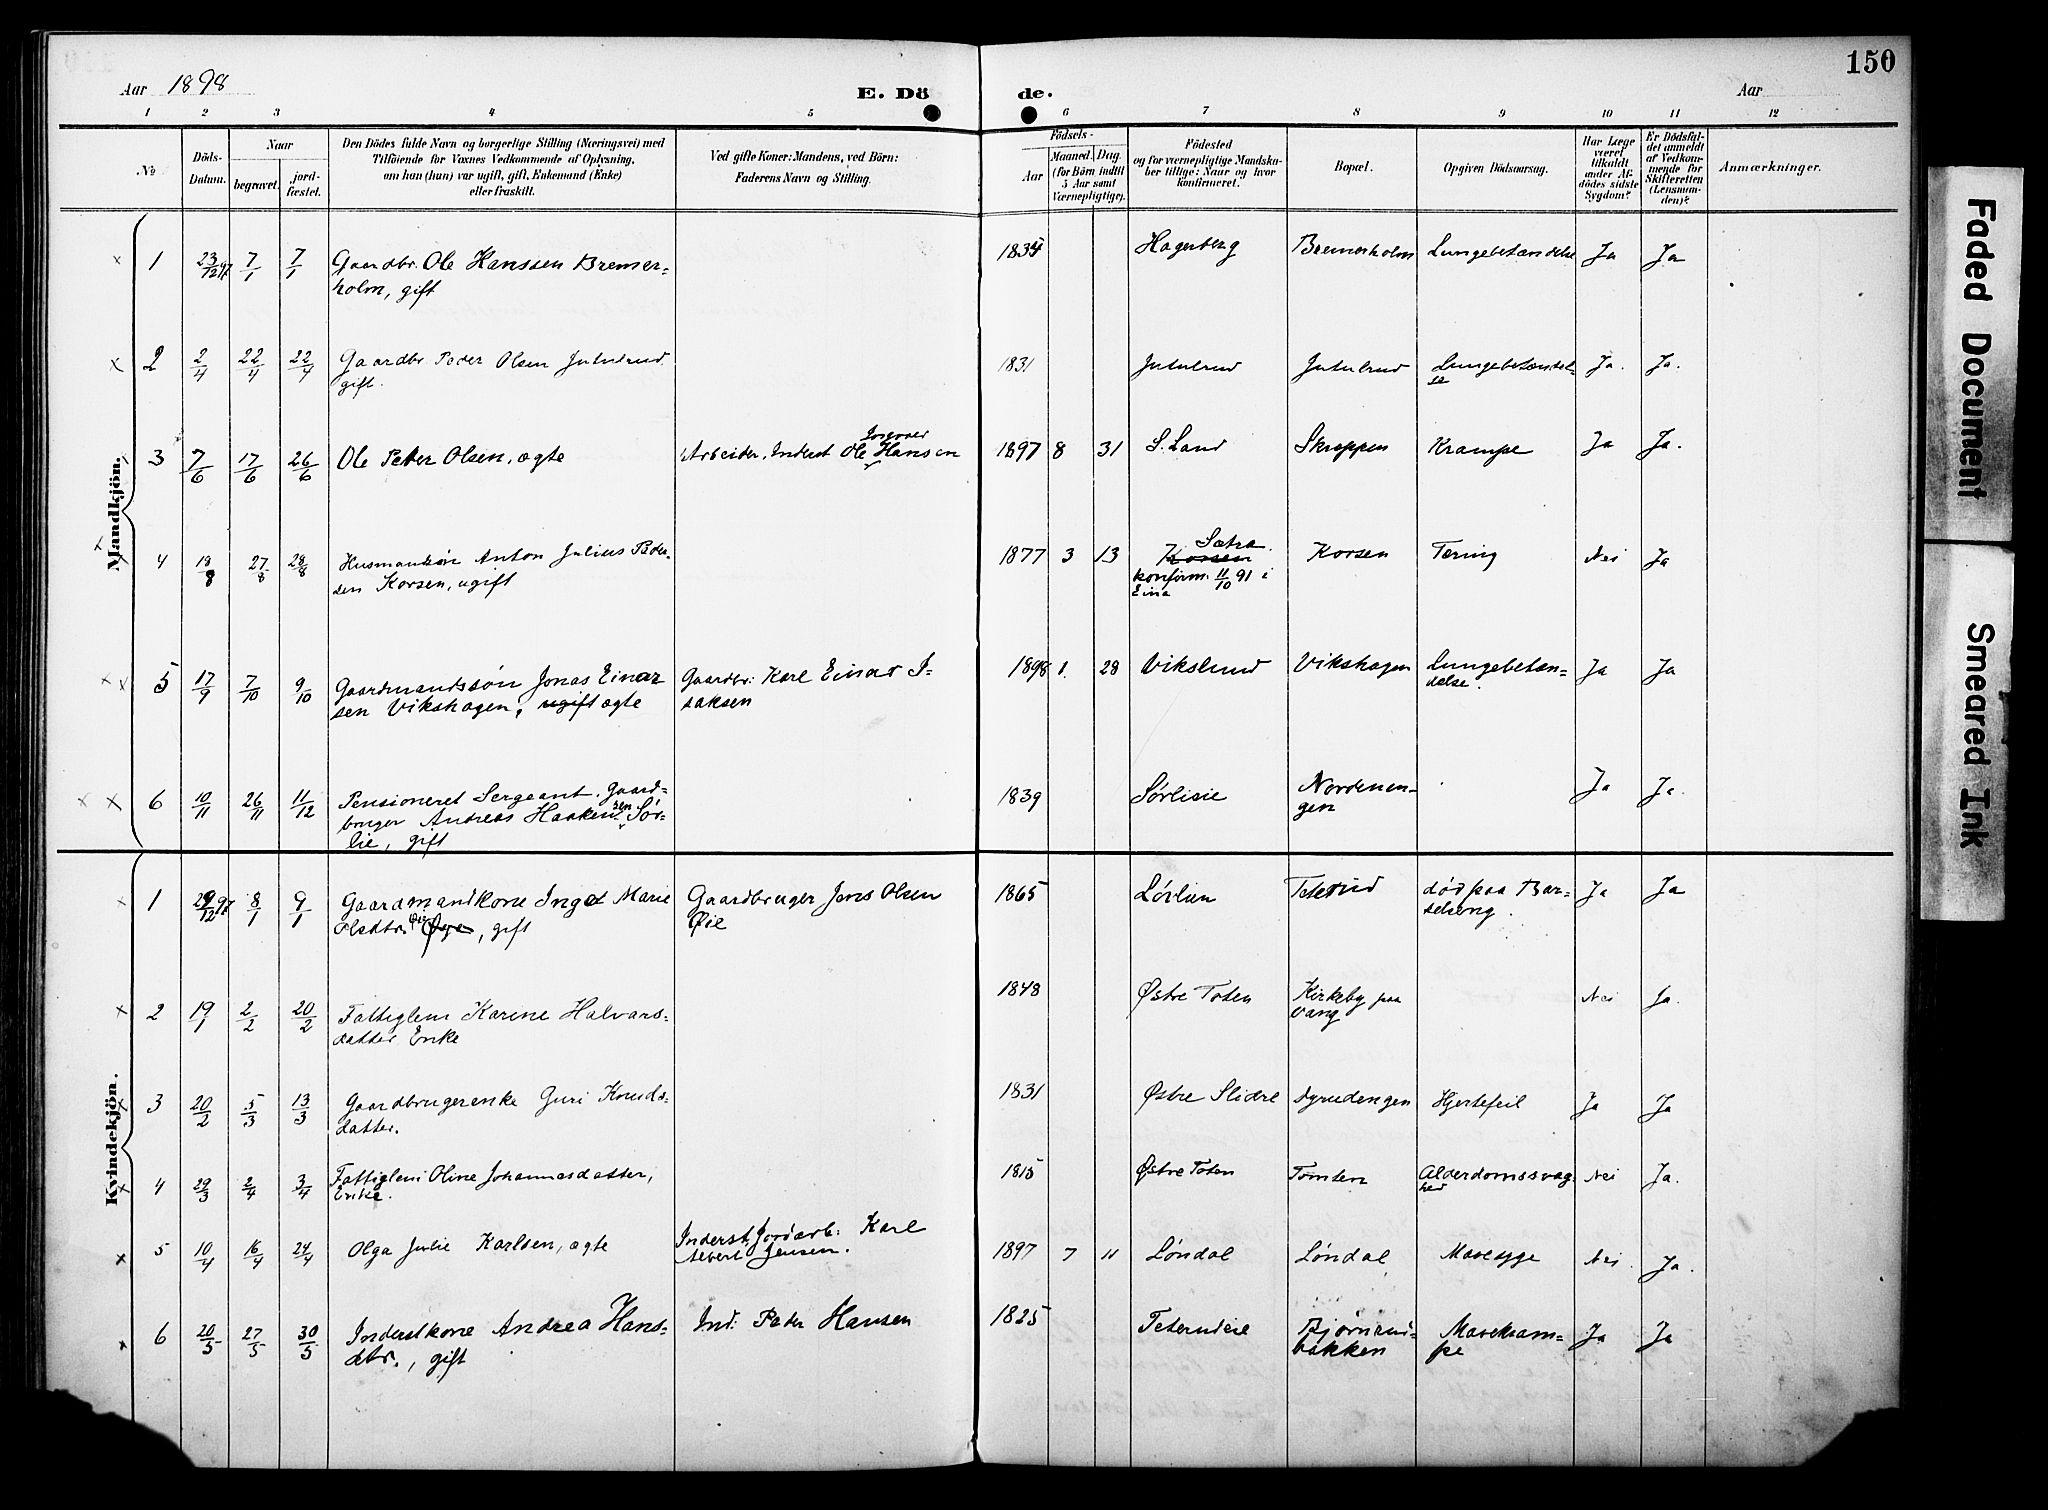 SAH, Vestre Toten prestekontor, H/Ha/Haa/L0012: Parish register (official) no. 12, 1890-1906, p. 150